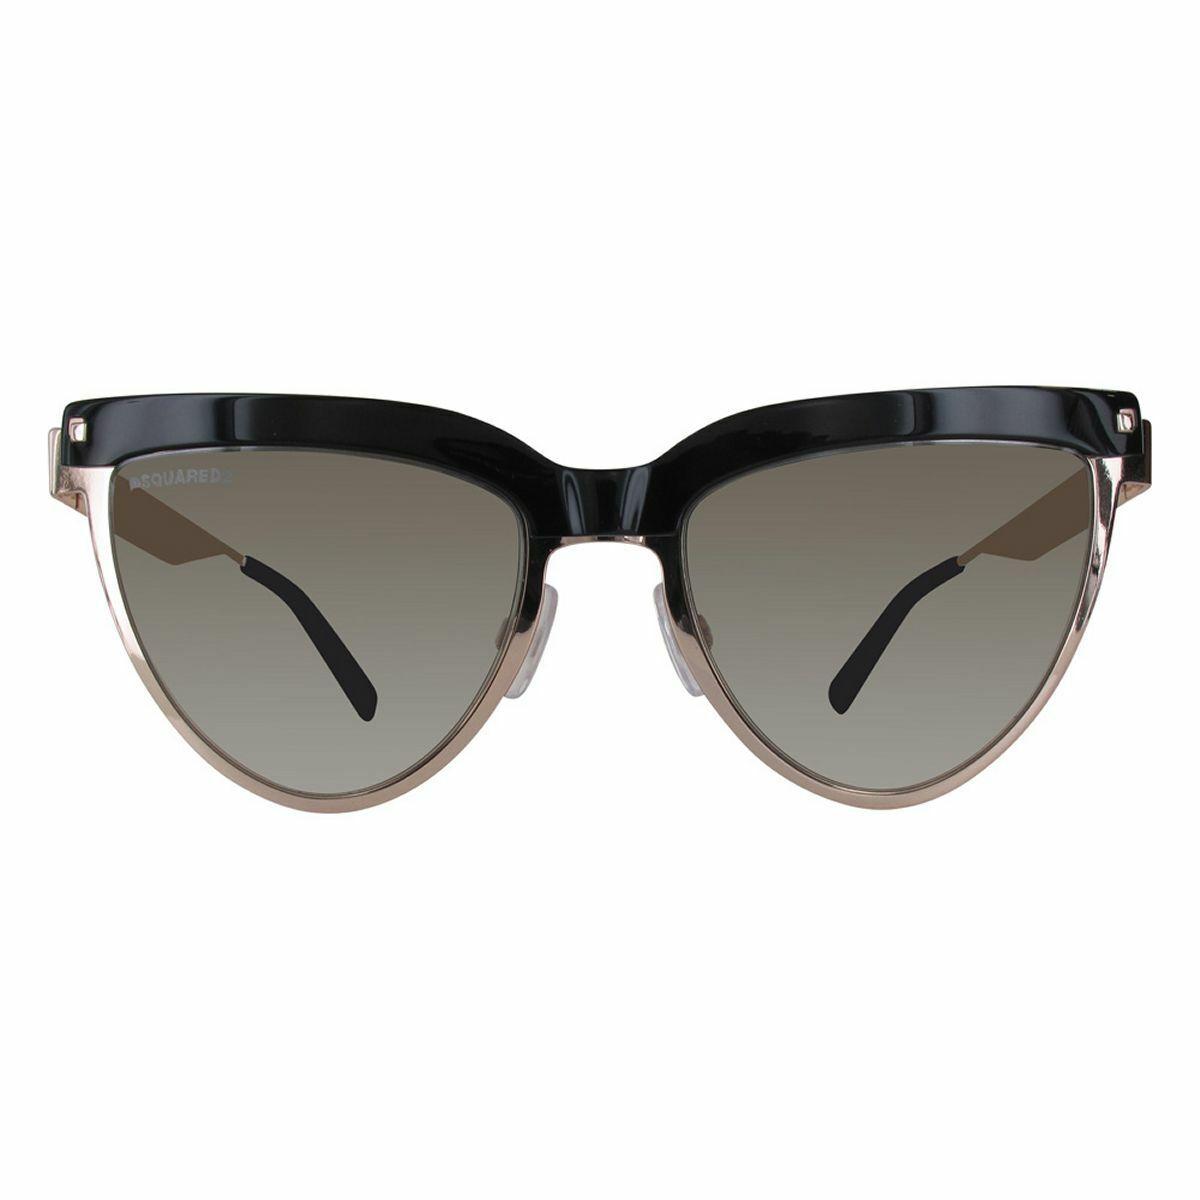 Dsquared2 Women's Sunglasses DQ0302-28B-53 Shiny Rose Gold/Gradient Smoke